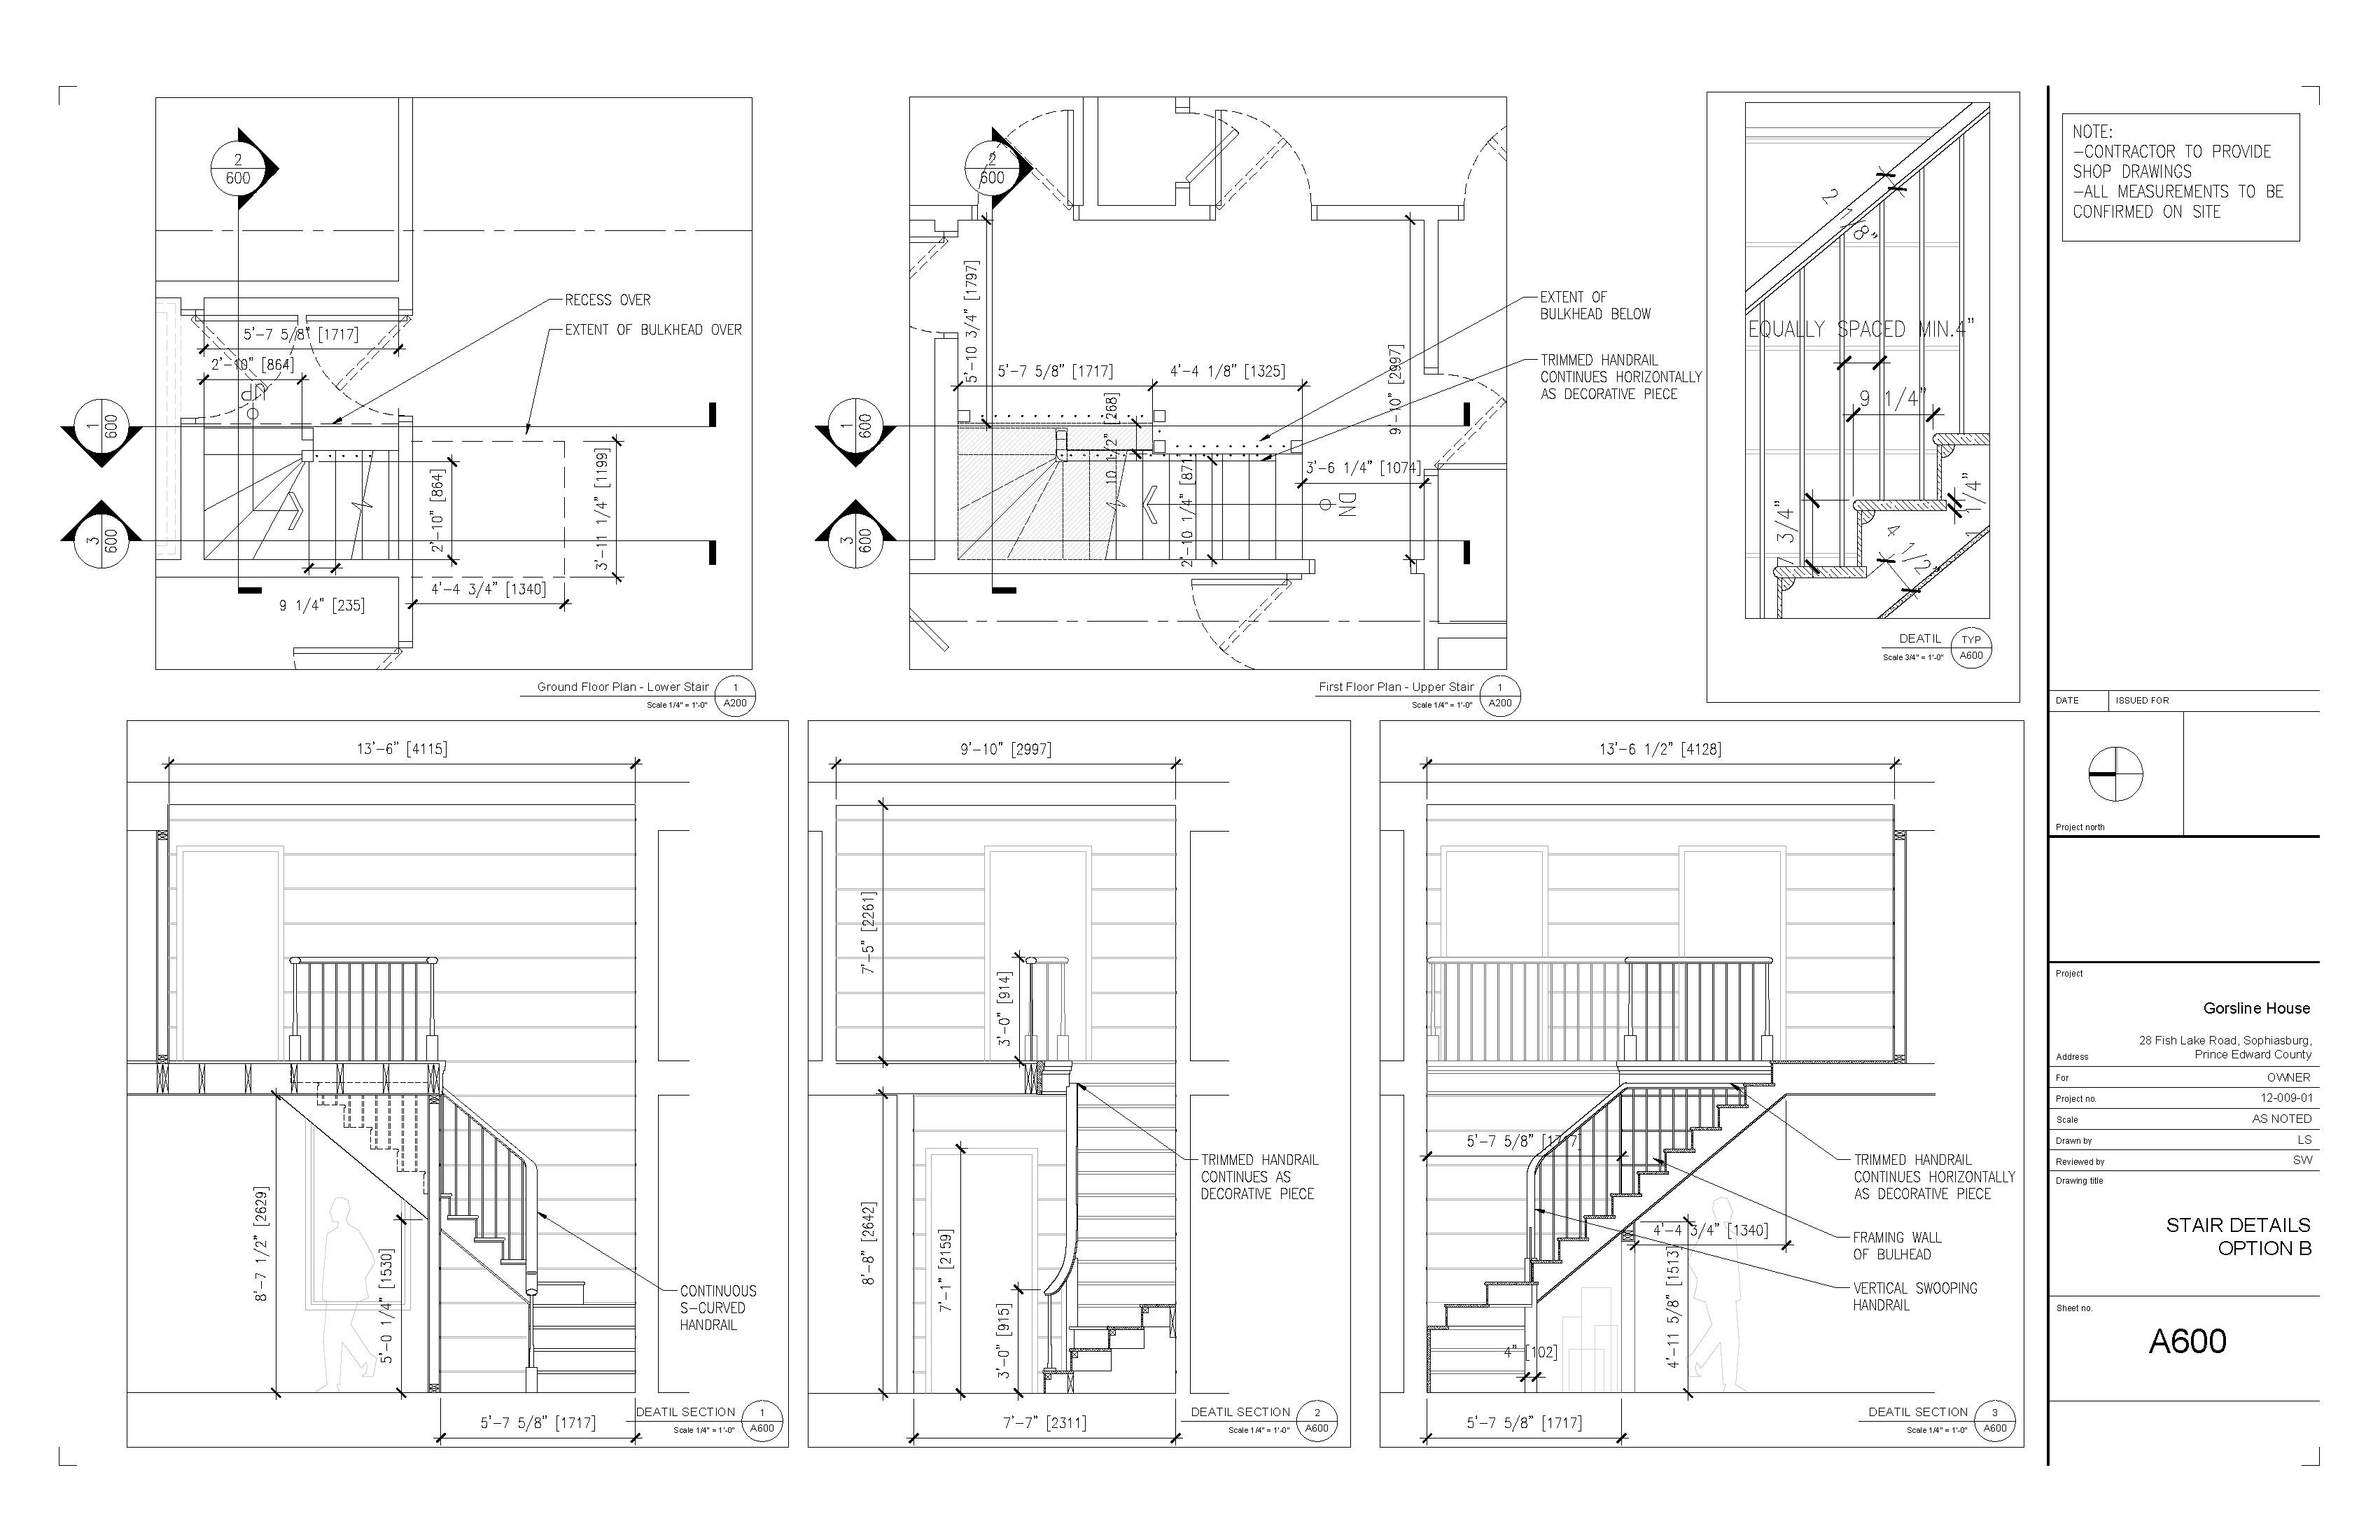 New stair plans gorsline house